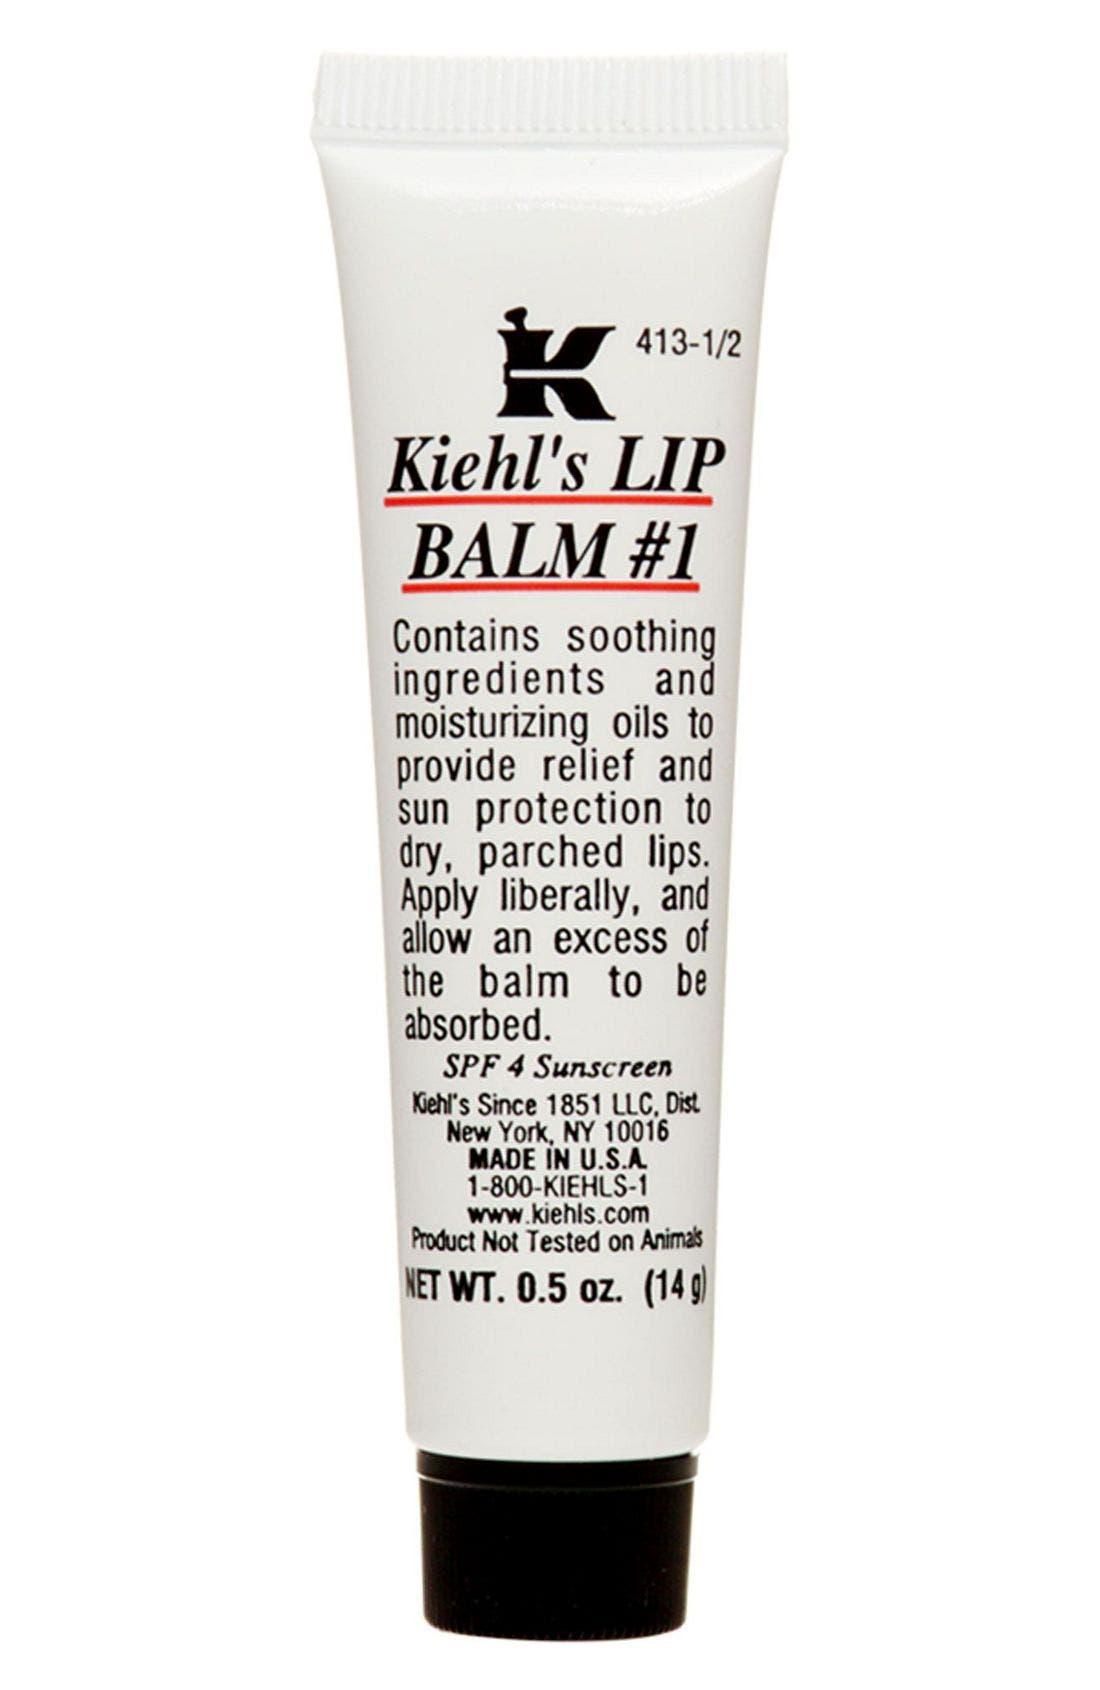 Kiehl's Since 1851 Lip Balm #1